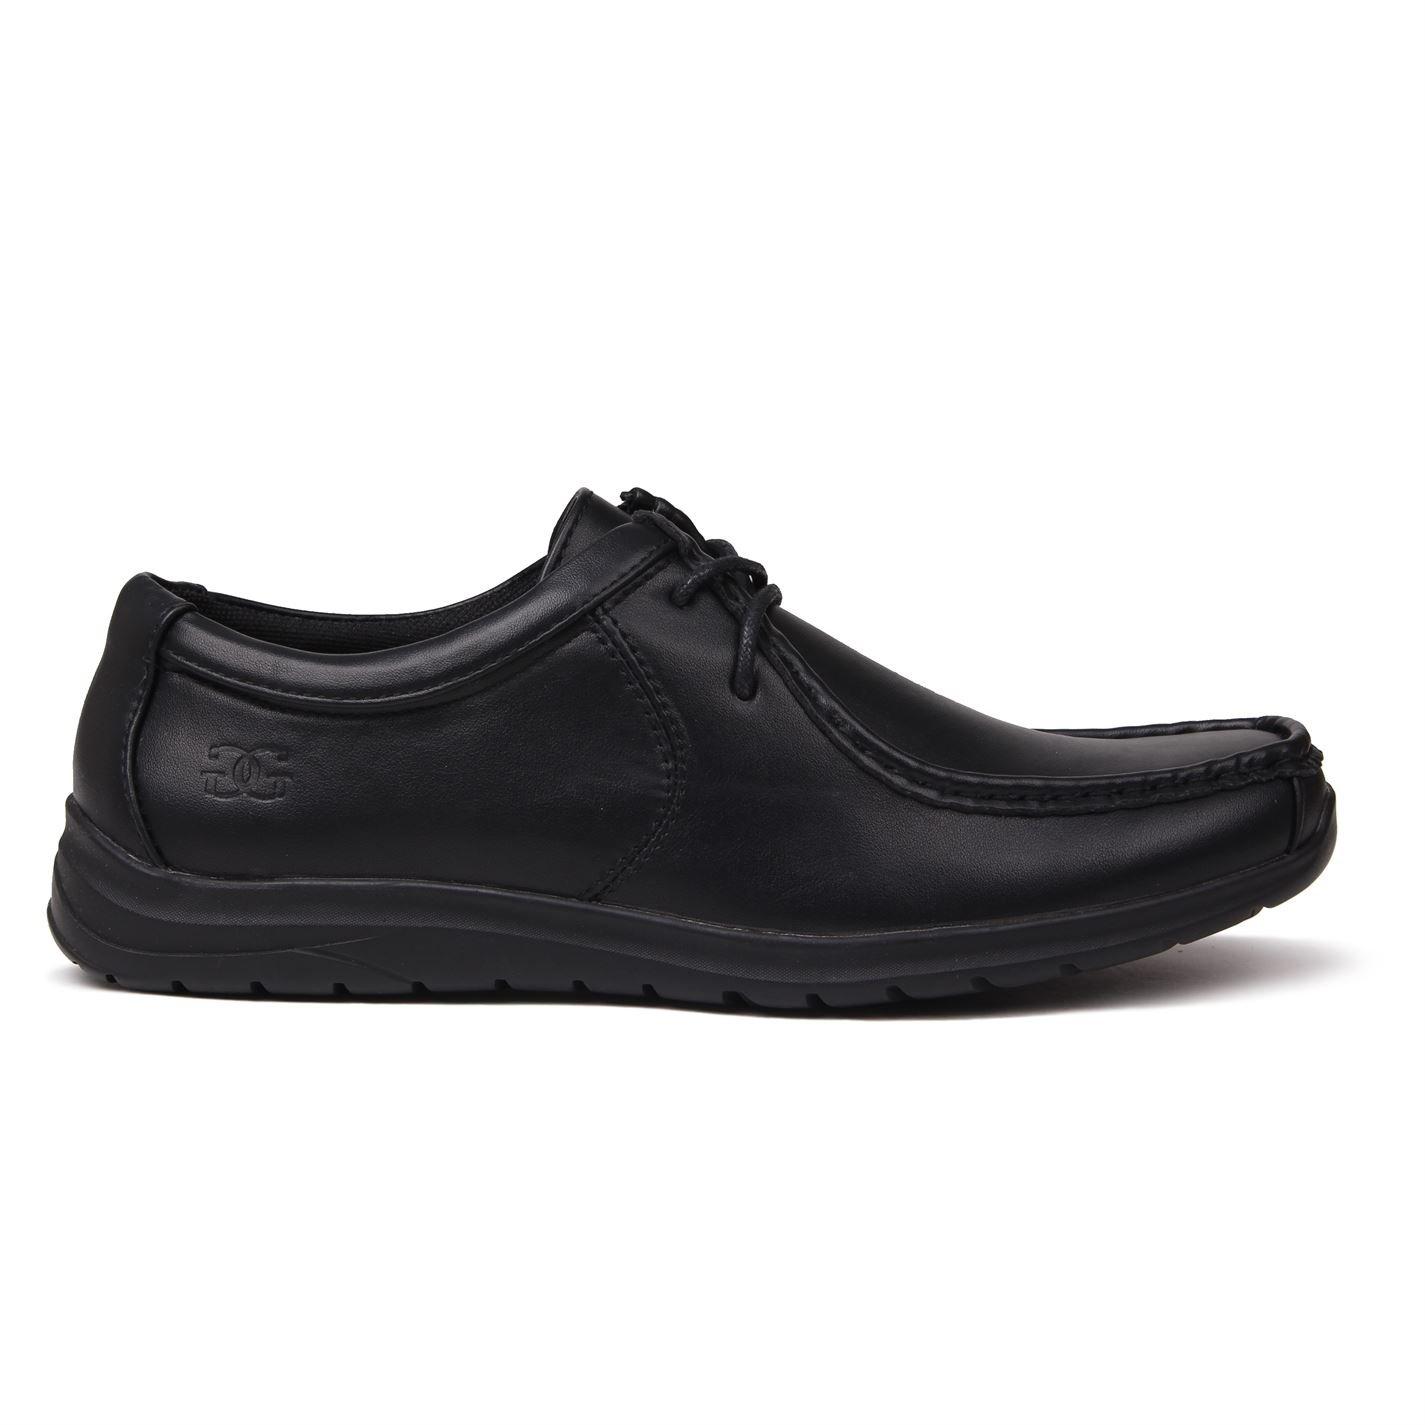 Giorgio - Zapatos de Cordones de Material Sintético para Hombre